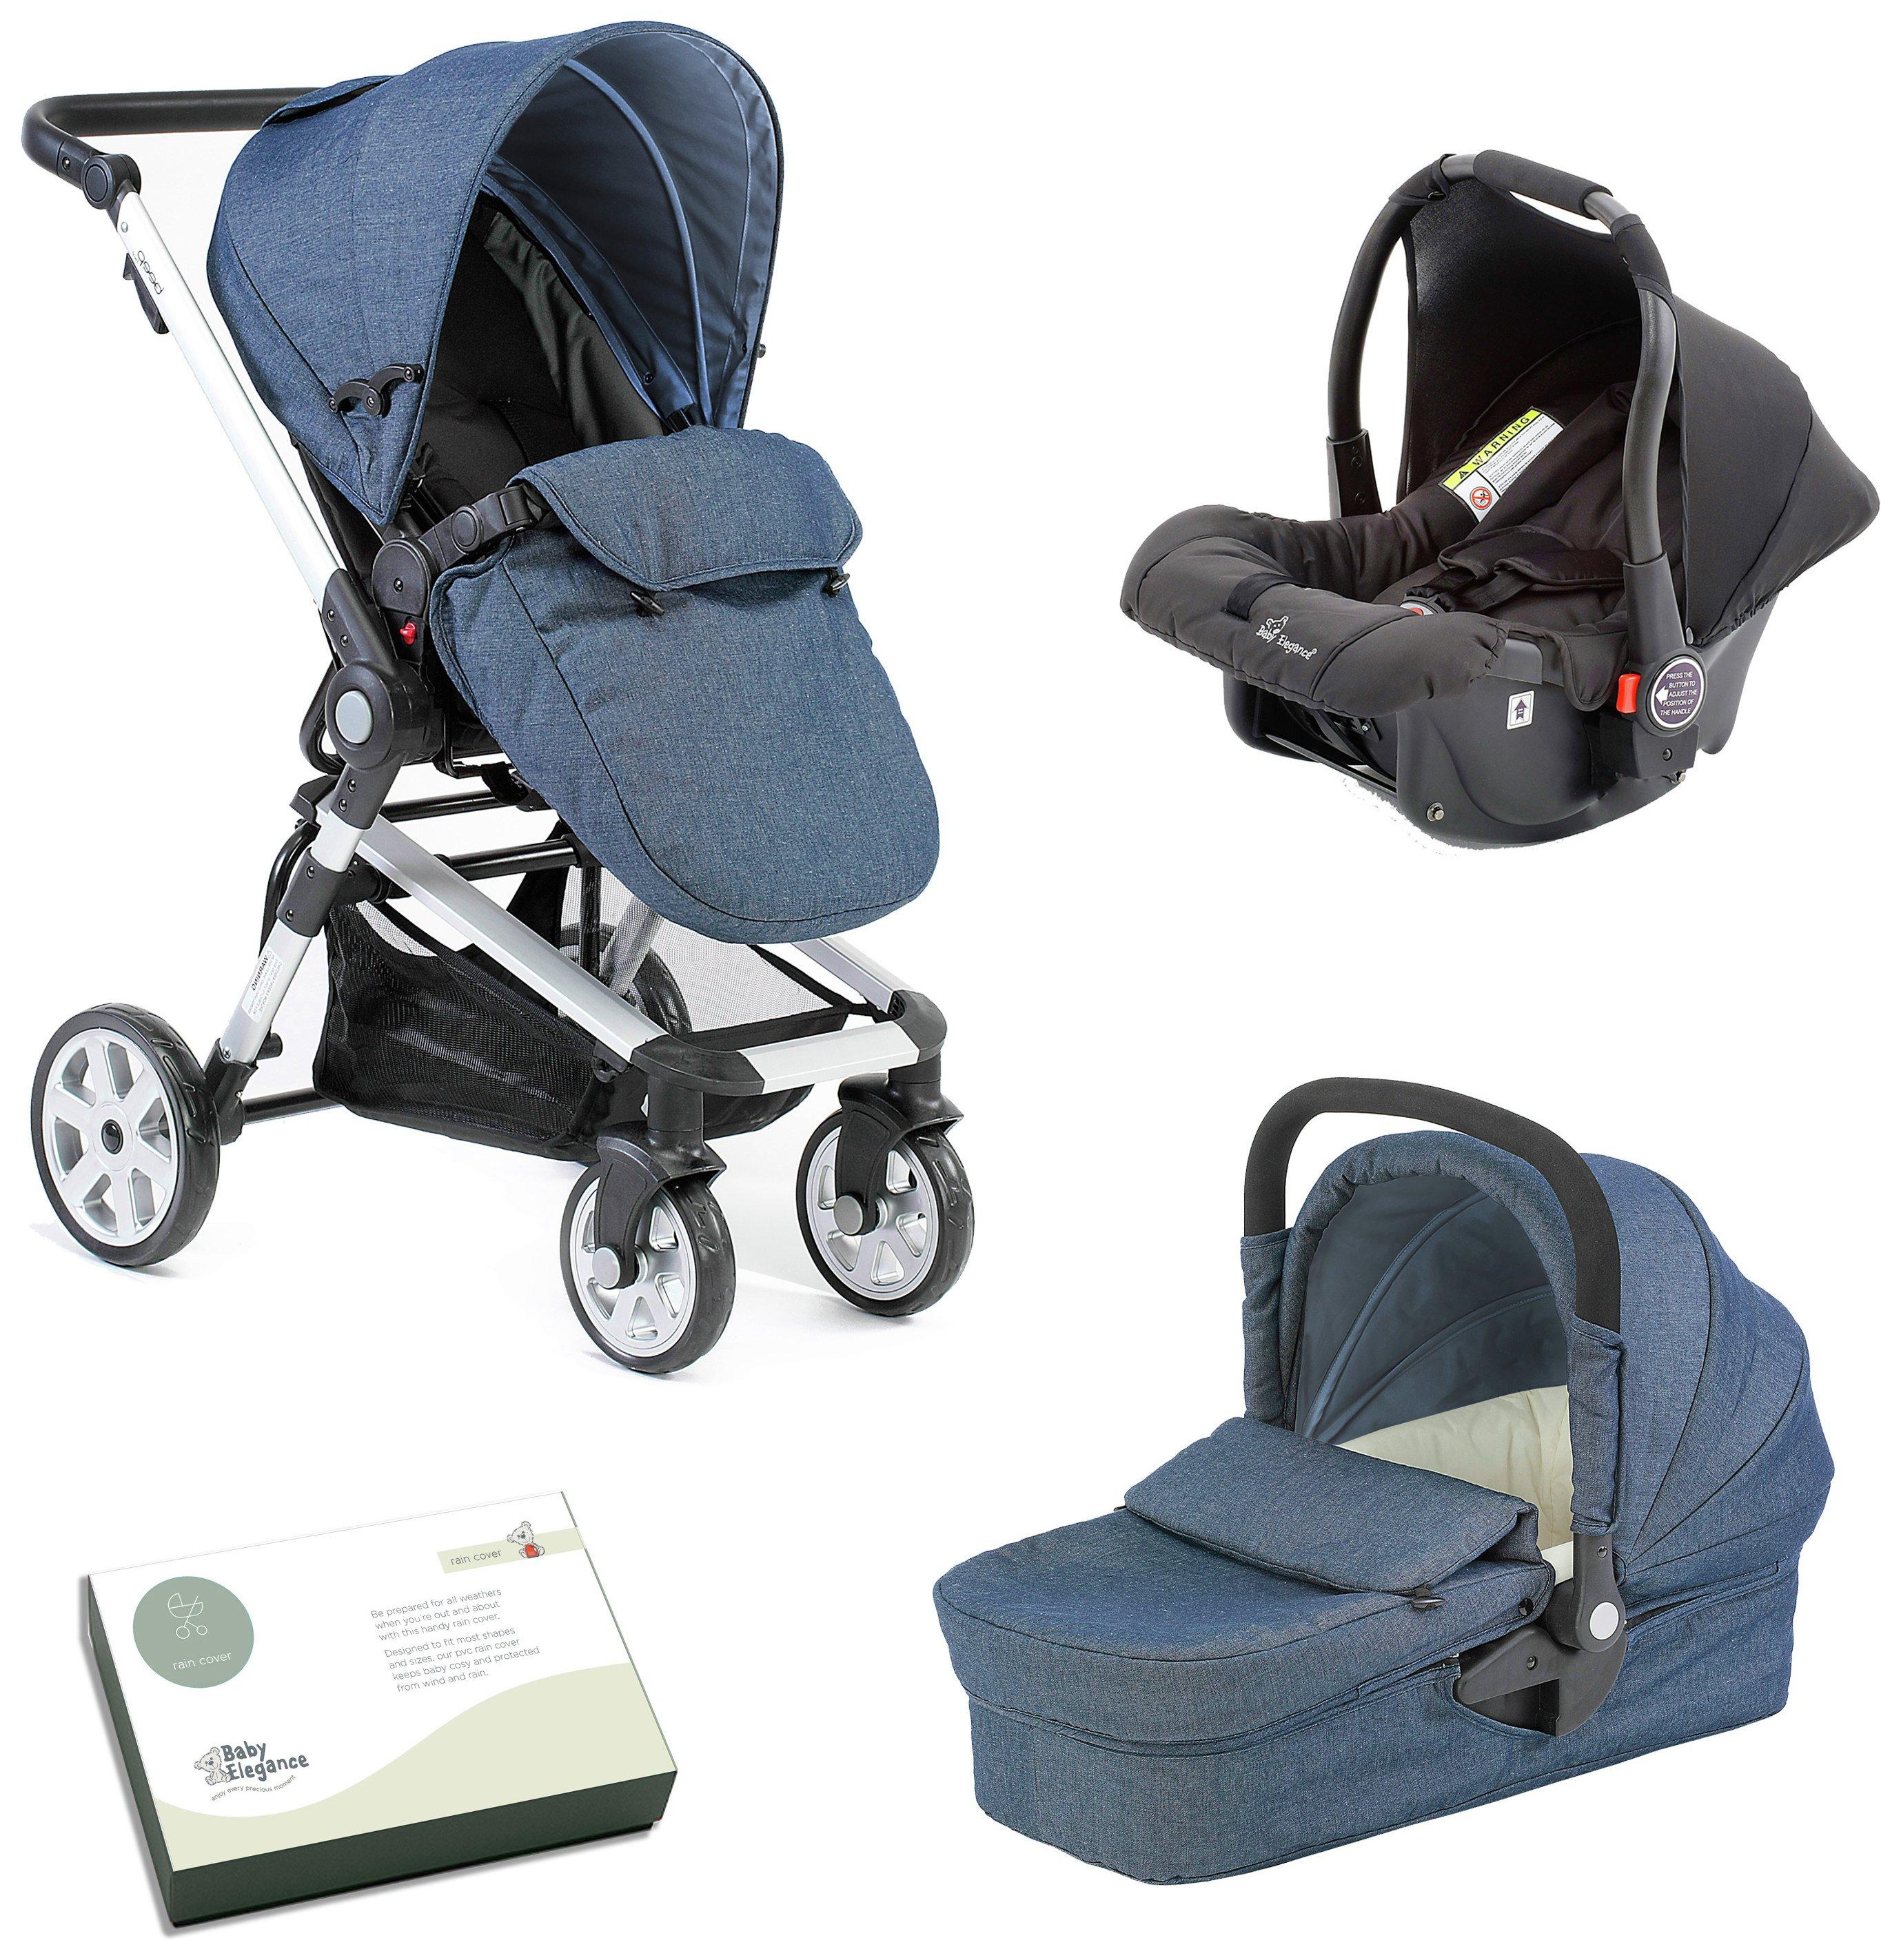 Image of Baby Elegance Beep Twist Travel System - Denim.